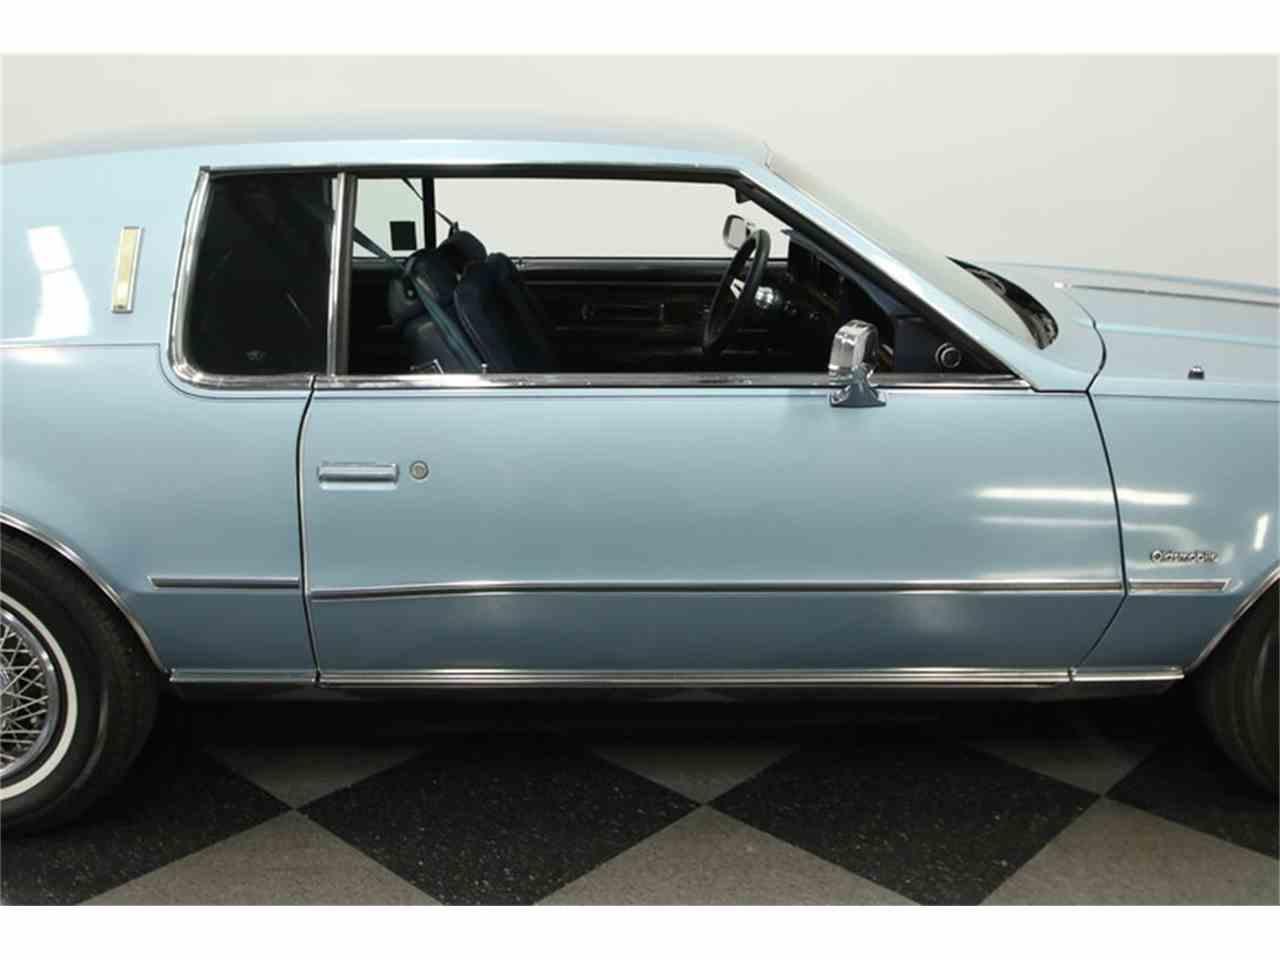 Large Picture of '85 Toronado - $9,995.00 - JPY6